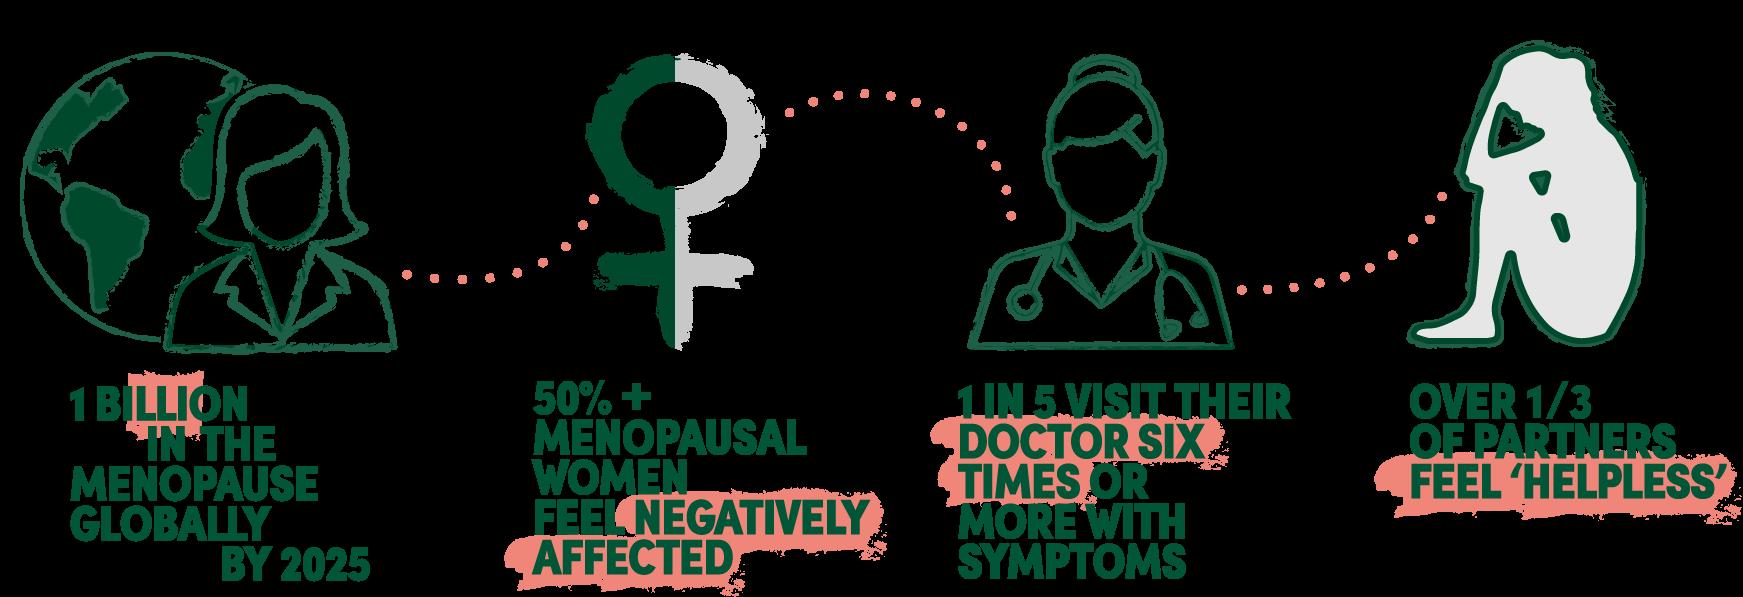 50% Menopausal Women Feel Negatively Affected